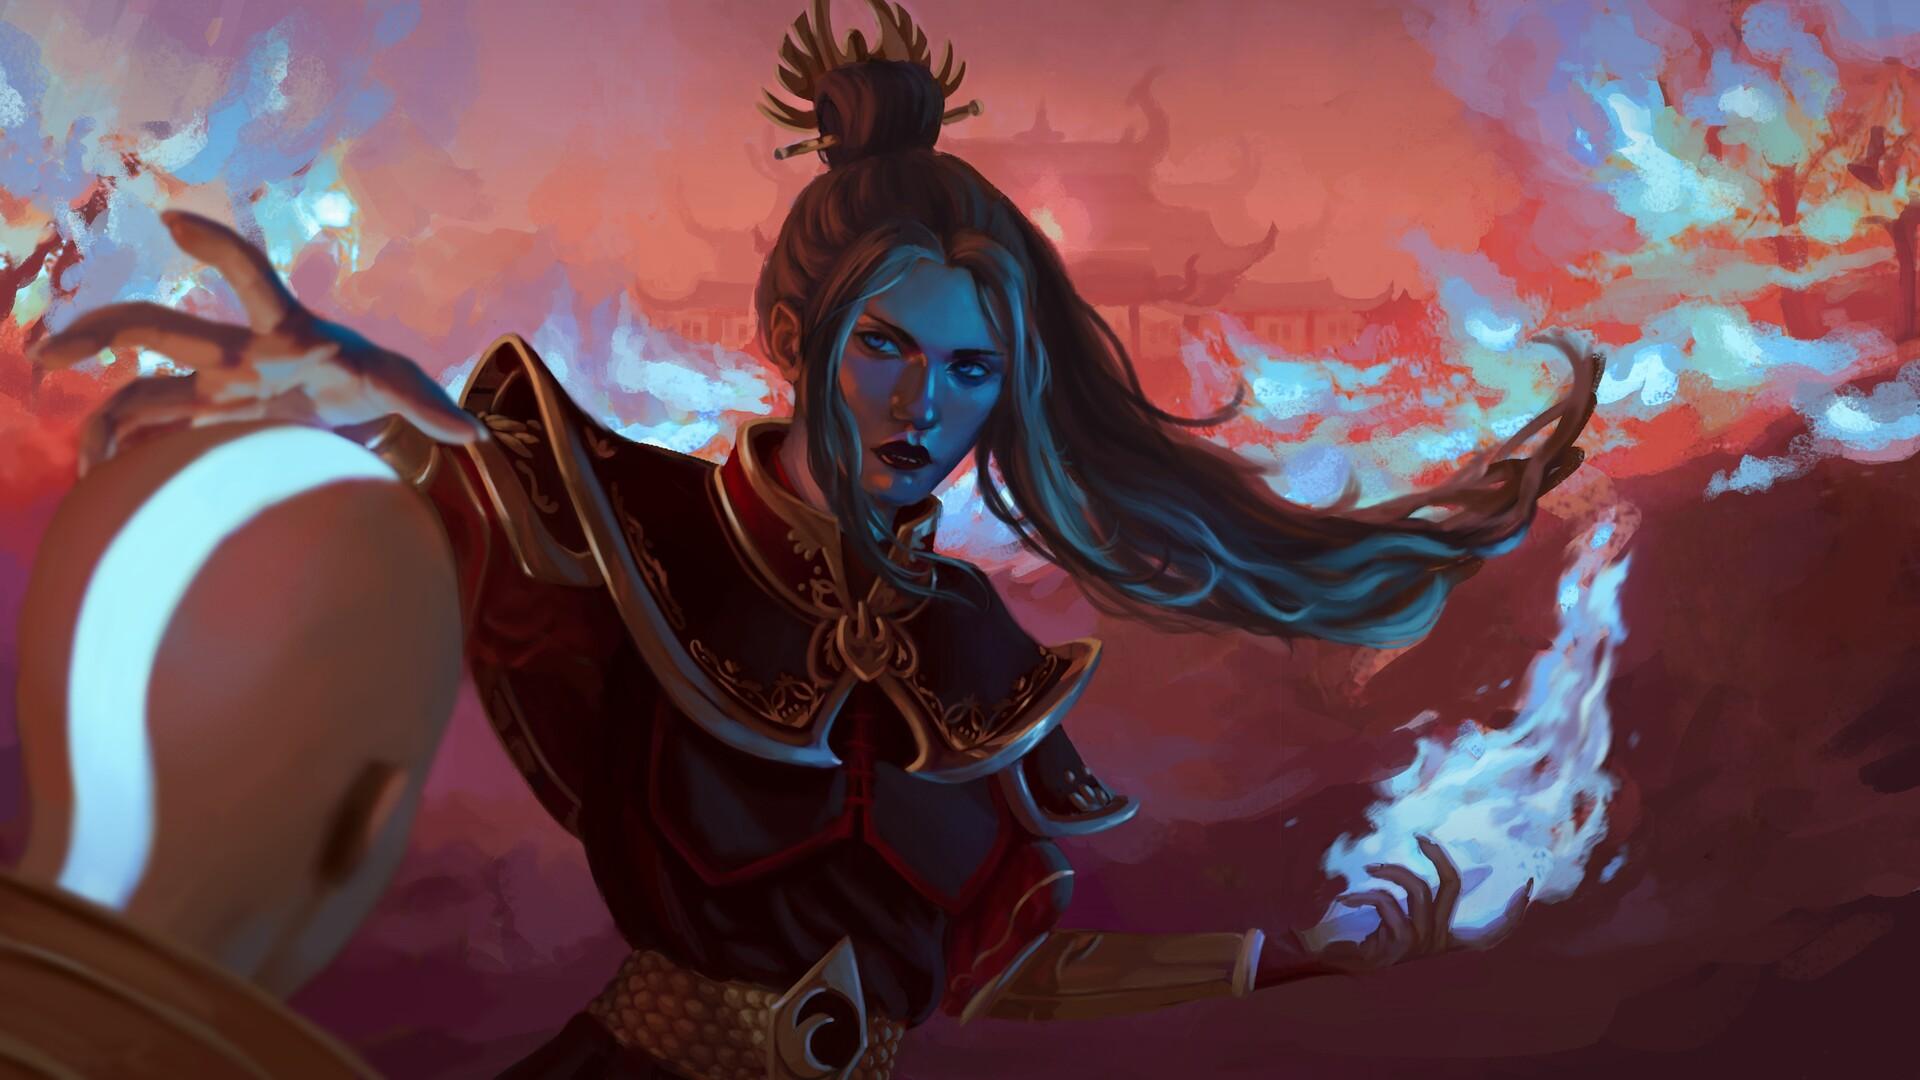 Wallpaper Princess Azula Avatar The Last Airbender Digital Art